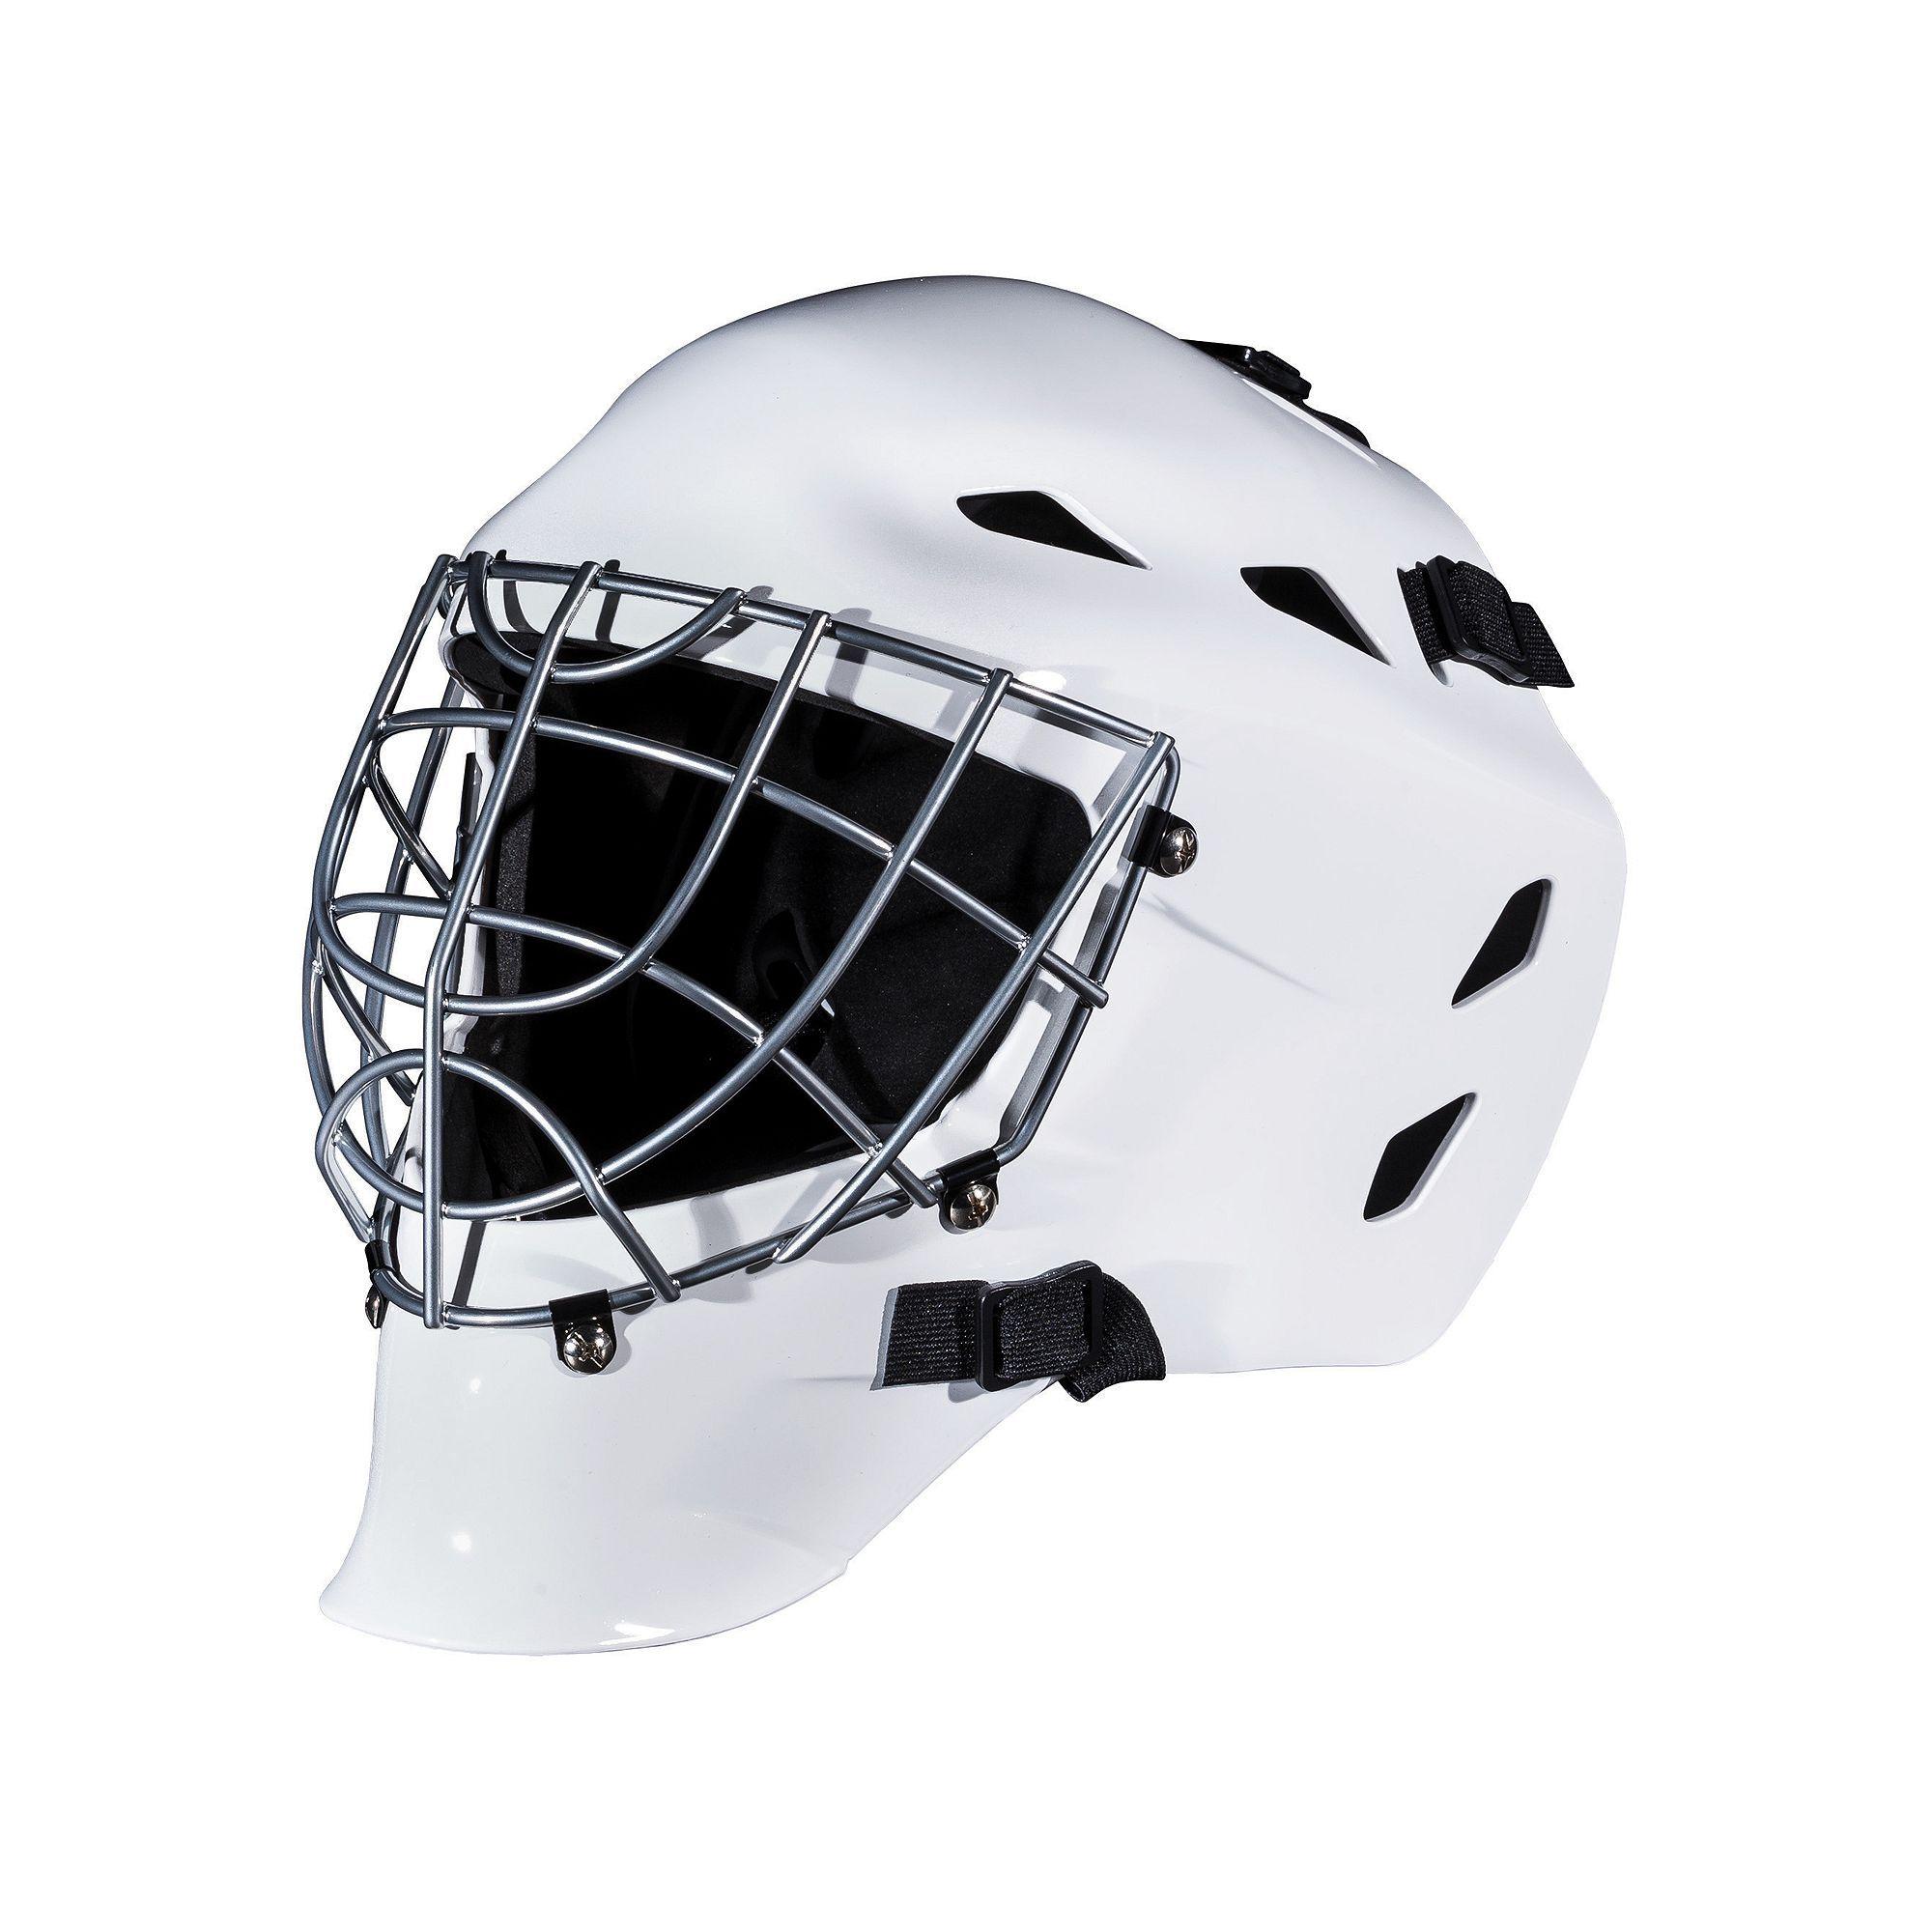 Franklin Sports Gfm 1500 White Street Hockey Goalie Face Mask Hockey Goalie Equipment Goalie Mask Street Hockey